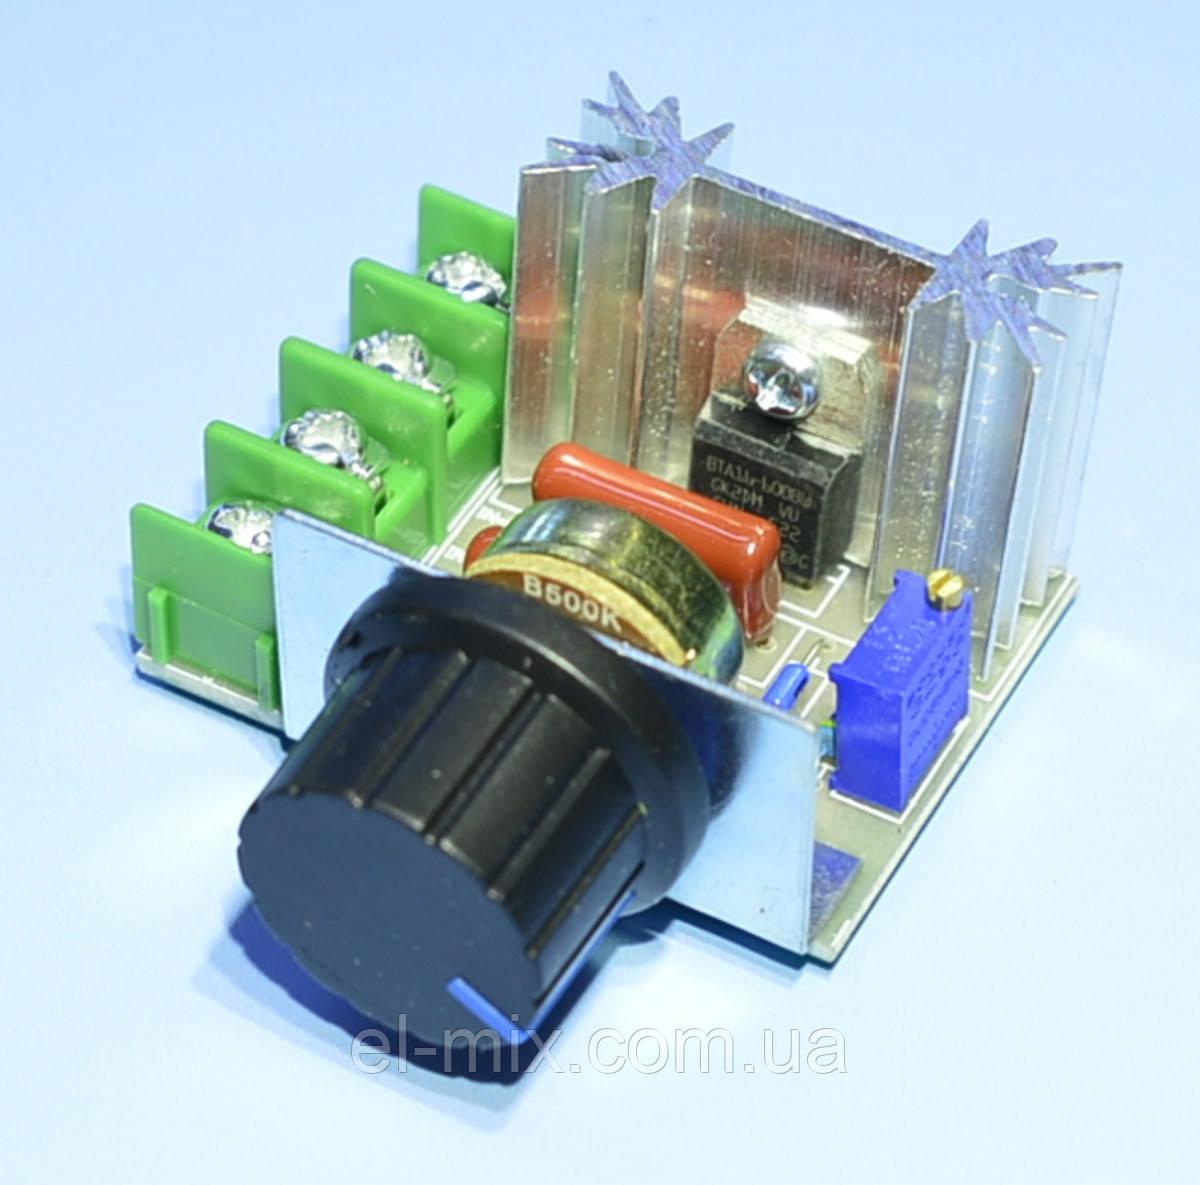 Модуль: регулятор мощности AC 220V 2КВт с радиатором, Китай